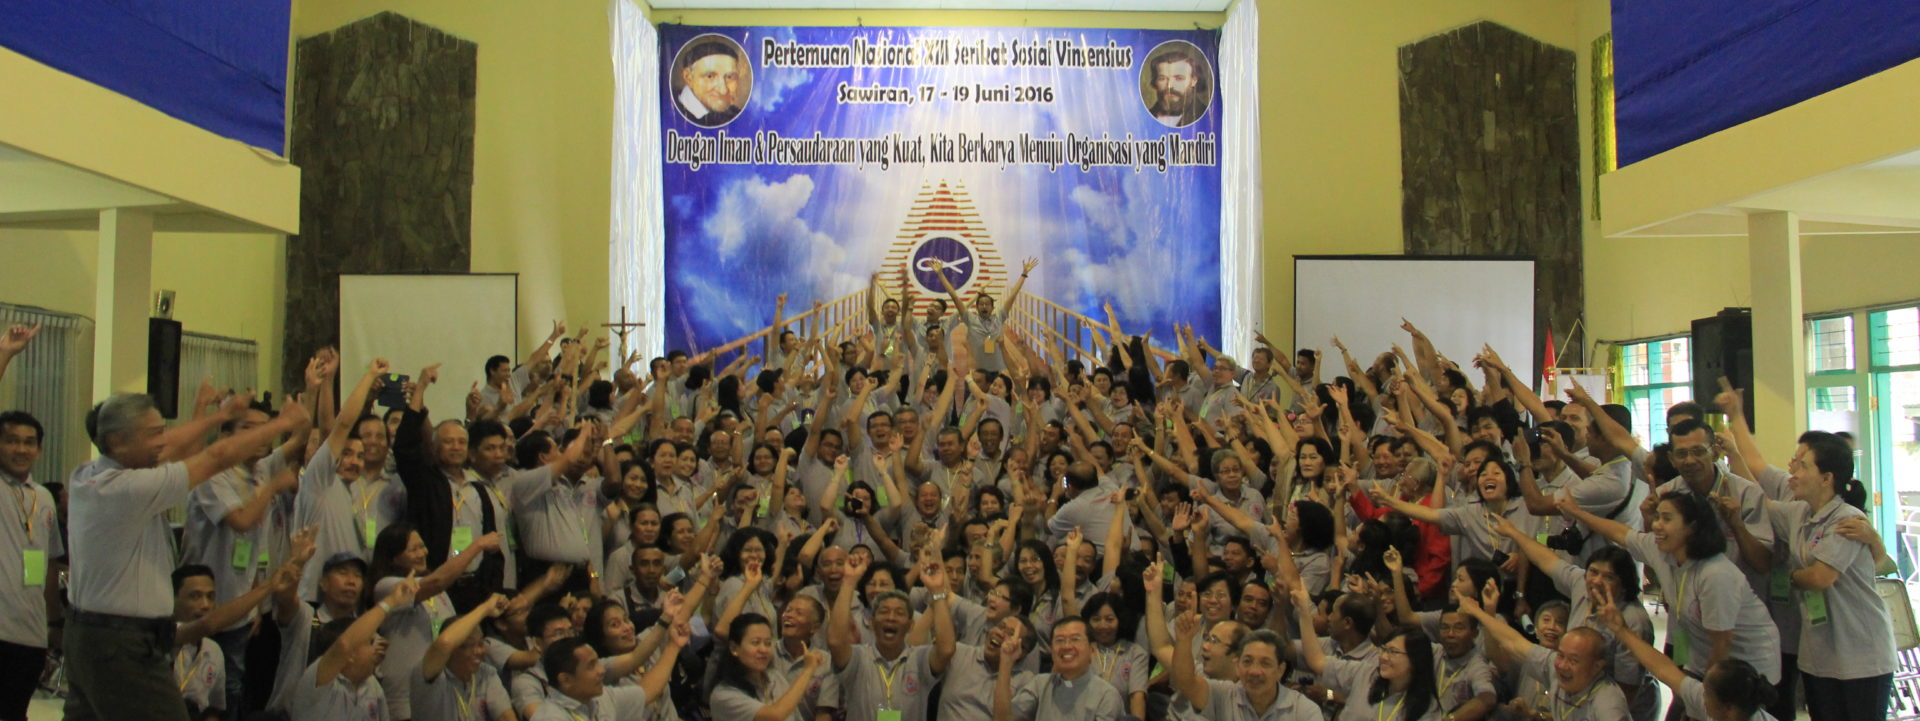 Serikat Sosial Vinsensius Indonesia